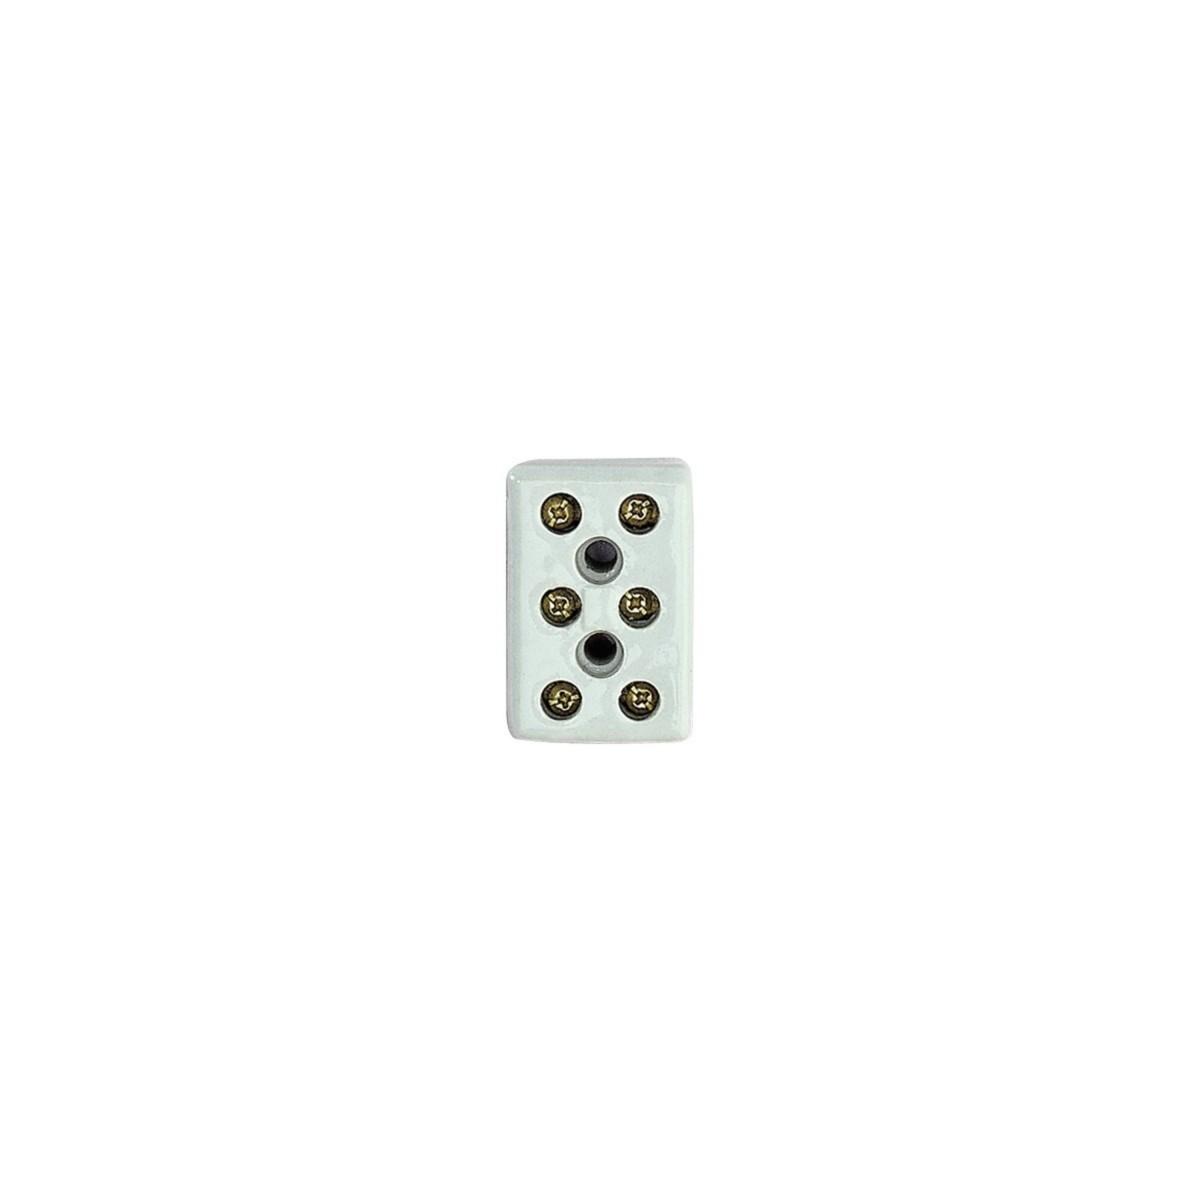 Elétrica Conector Mult .6mm2 Porcelana Tramontina